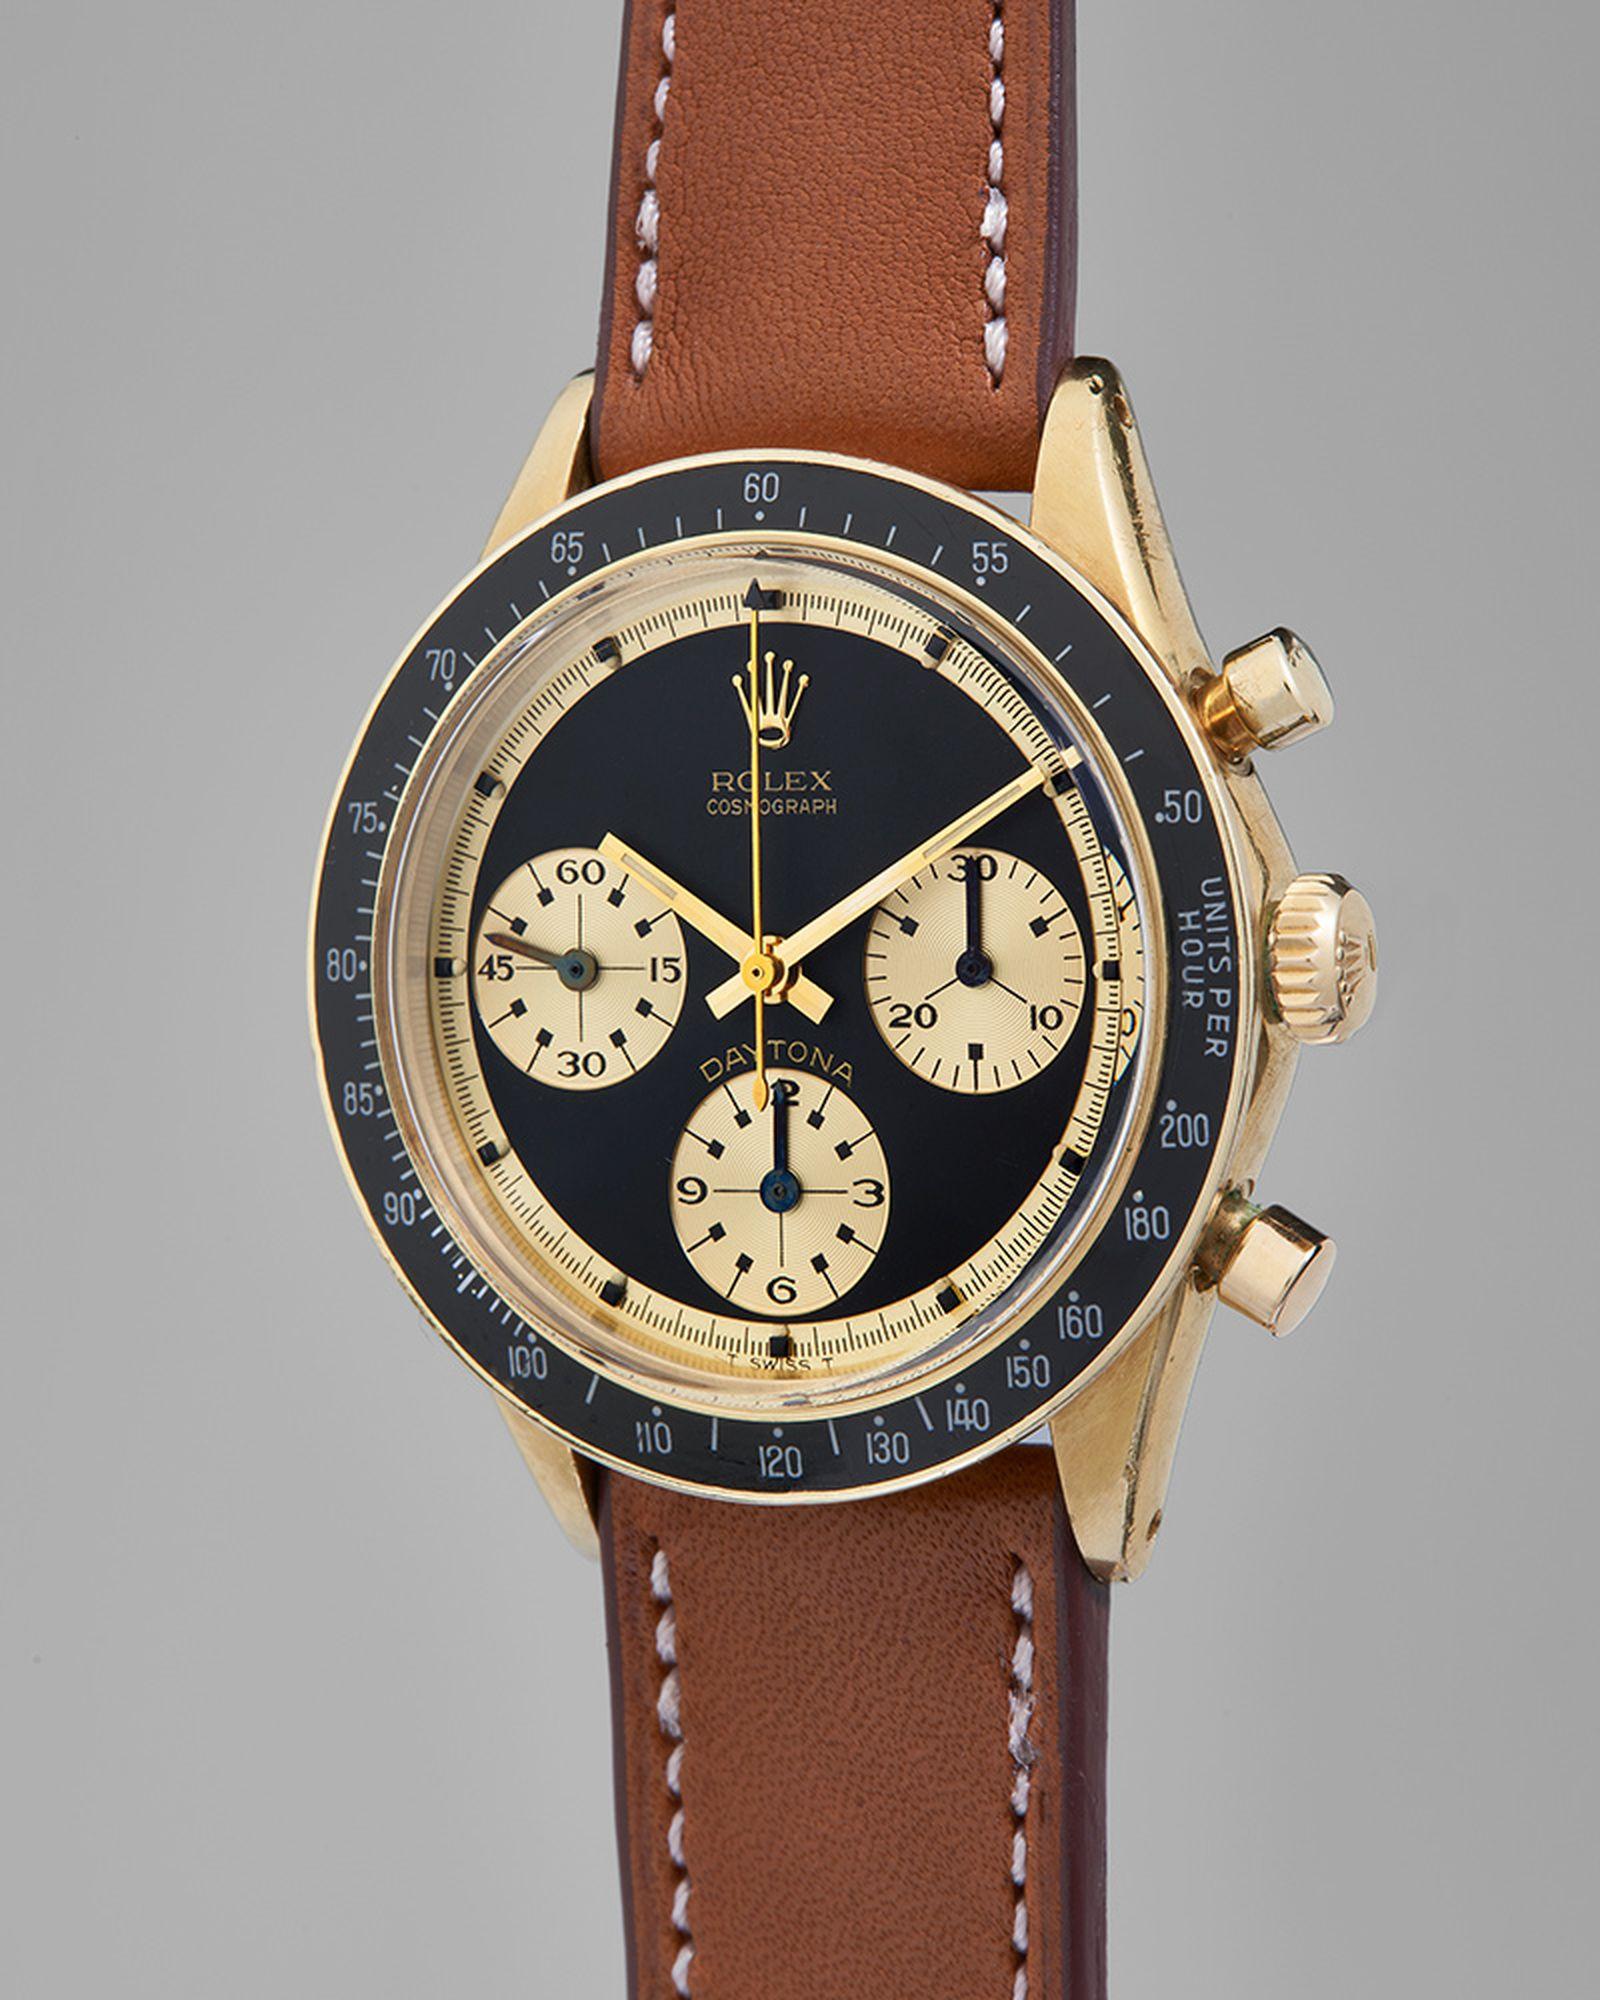 rolex-watches-phillips-auction-05